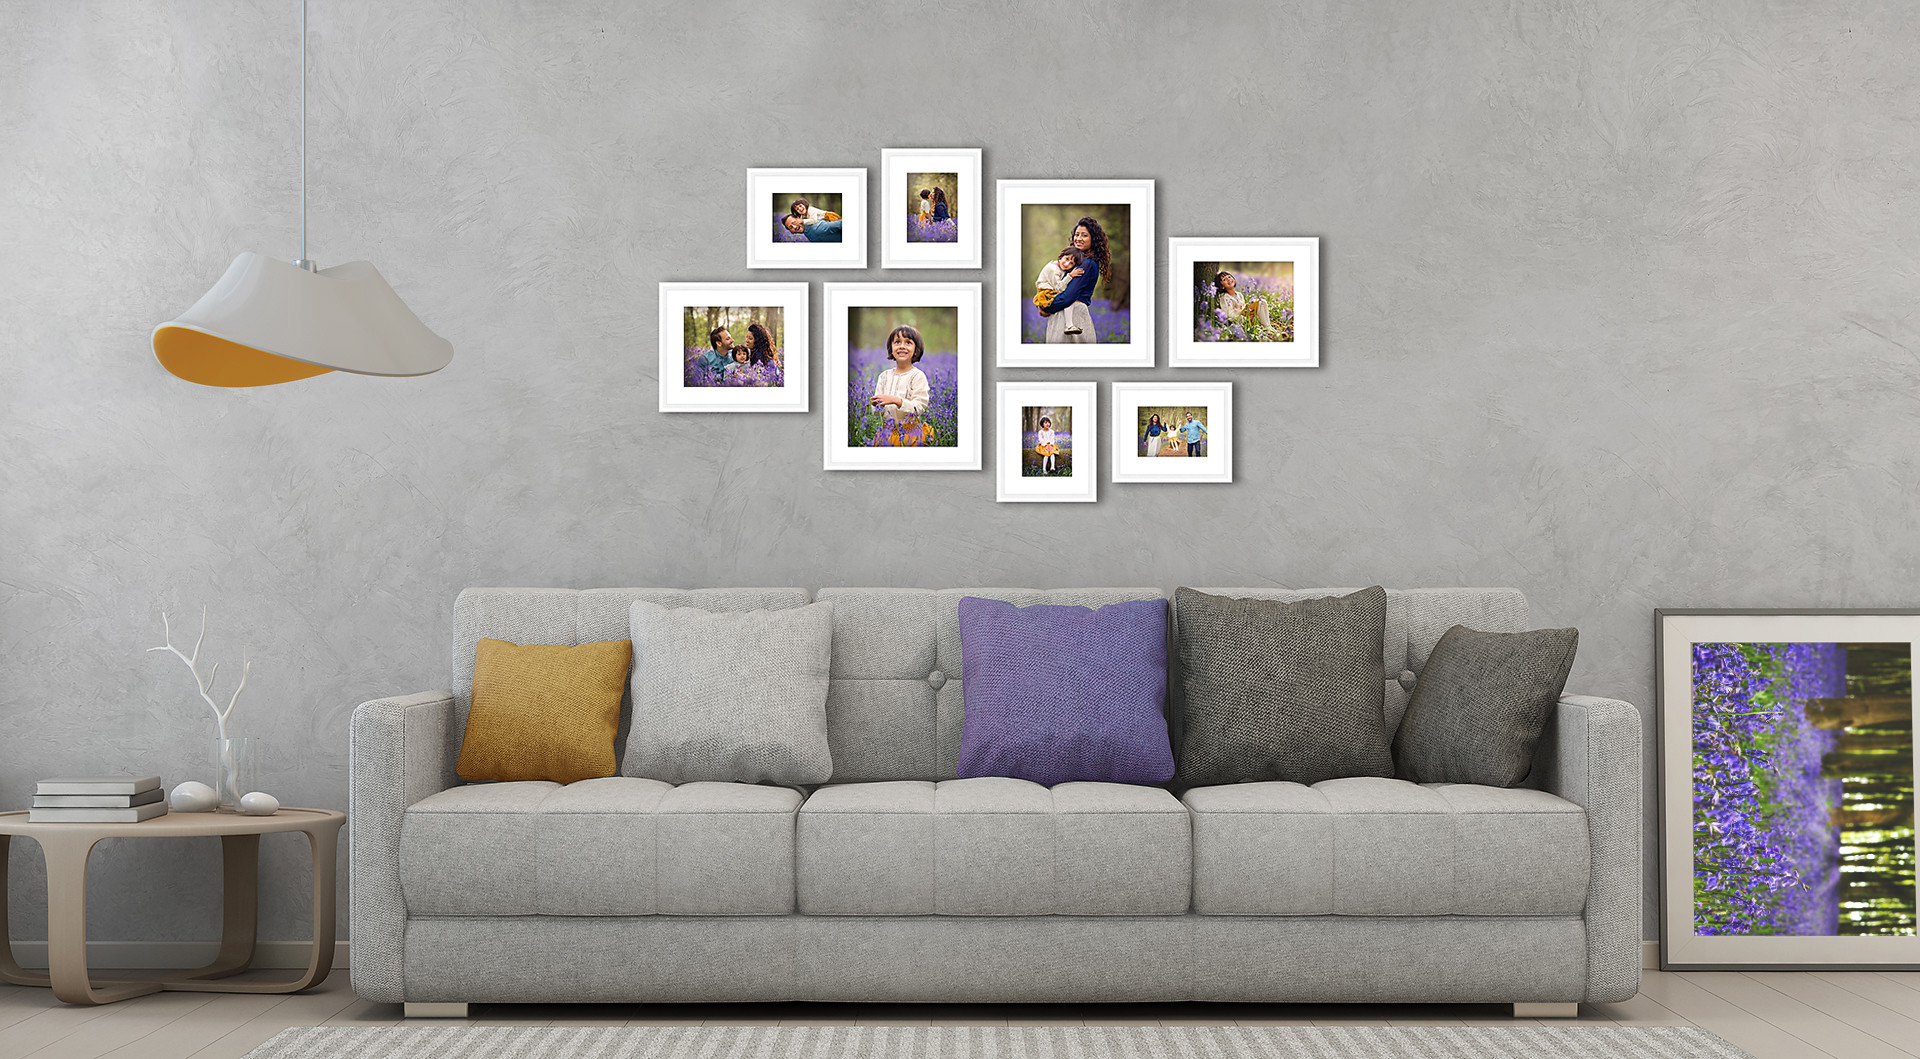 Frame-gallery-option-1-example.jpg